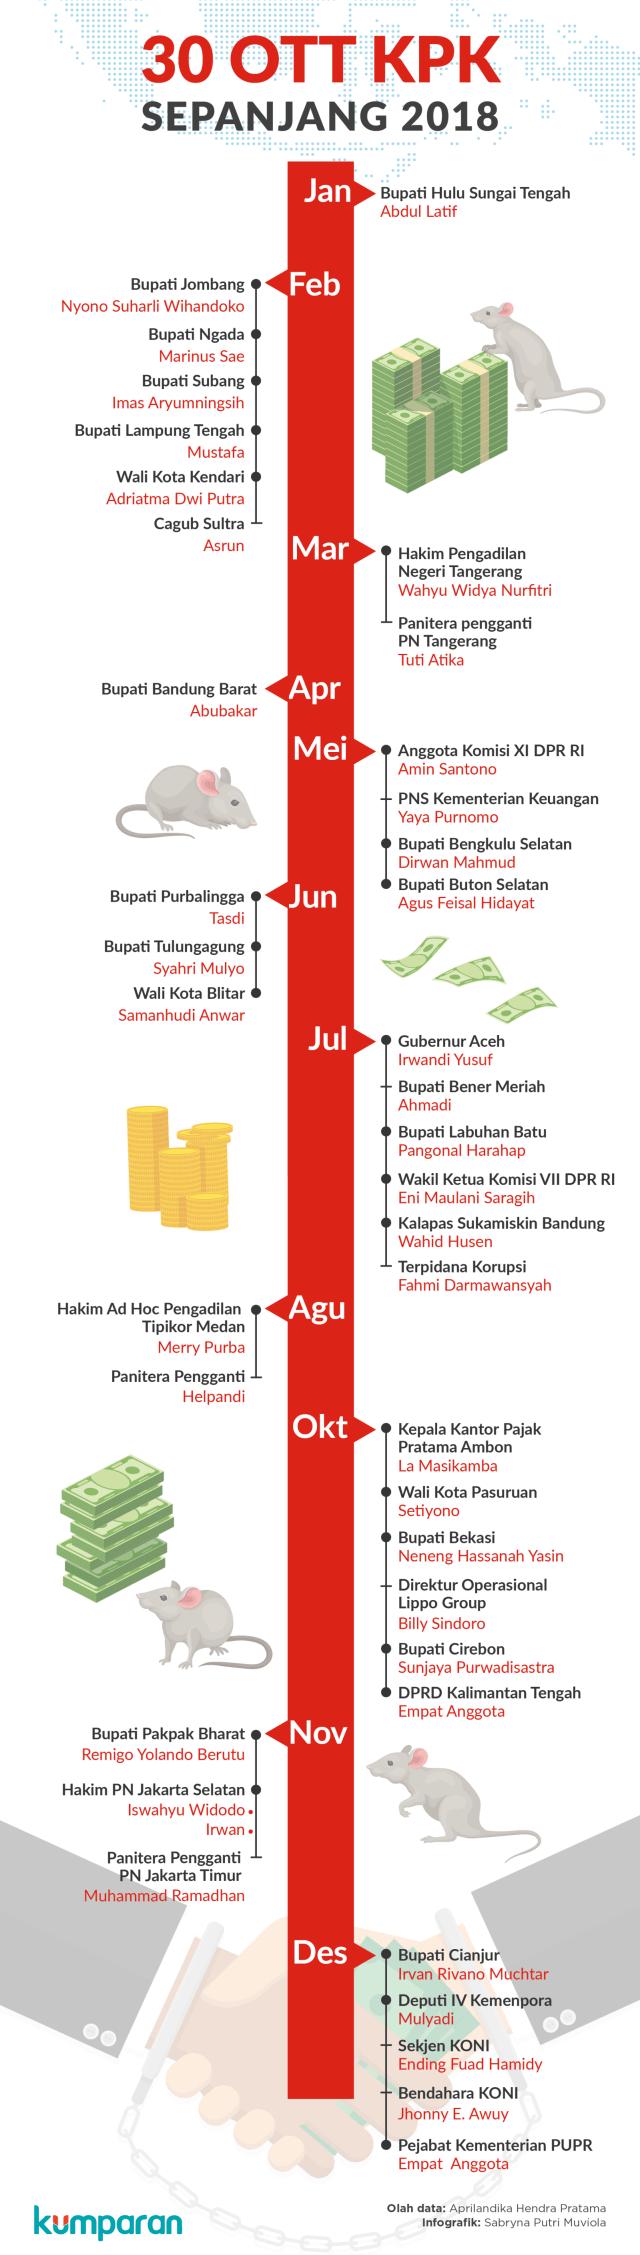 Anggaran Bocor: Diungkap Prabowo, Dibantah Jokowi, Dibenarkan JK (757842)